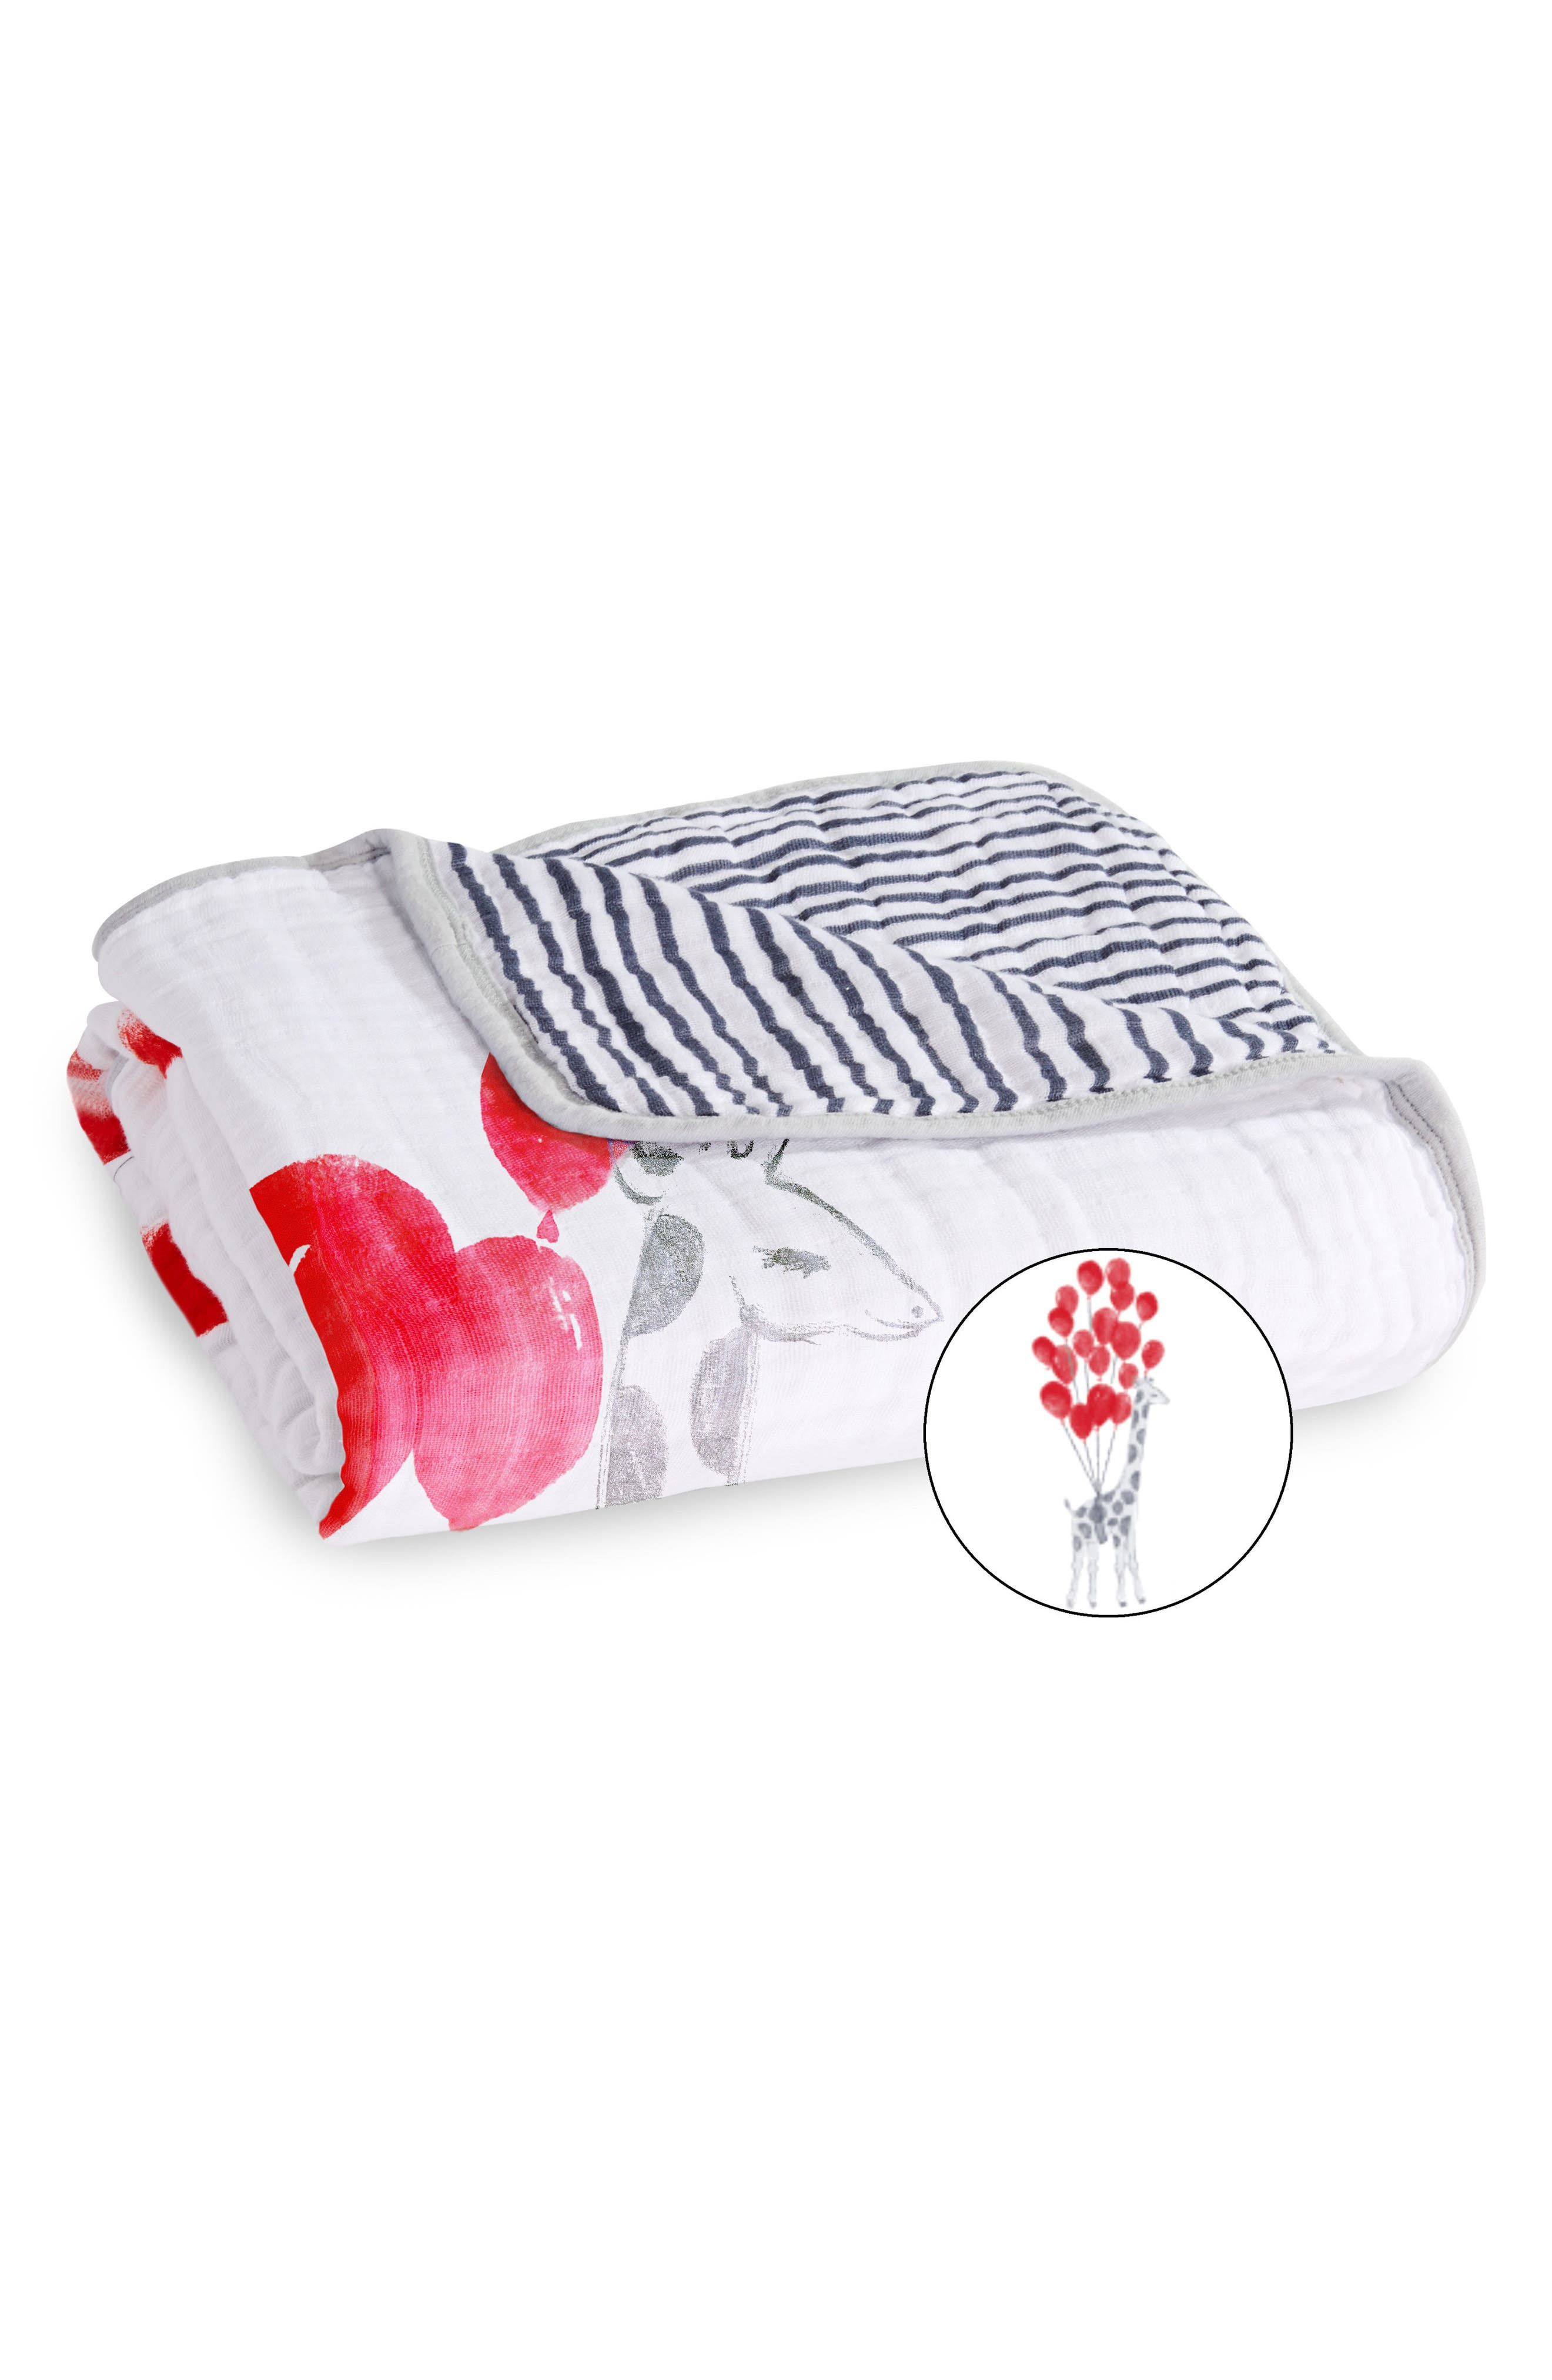 aden + anais Classic Dream Blanket™